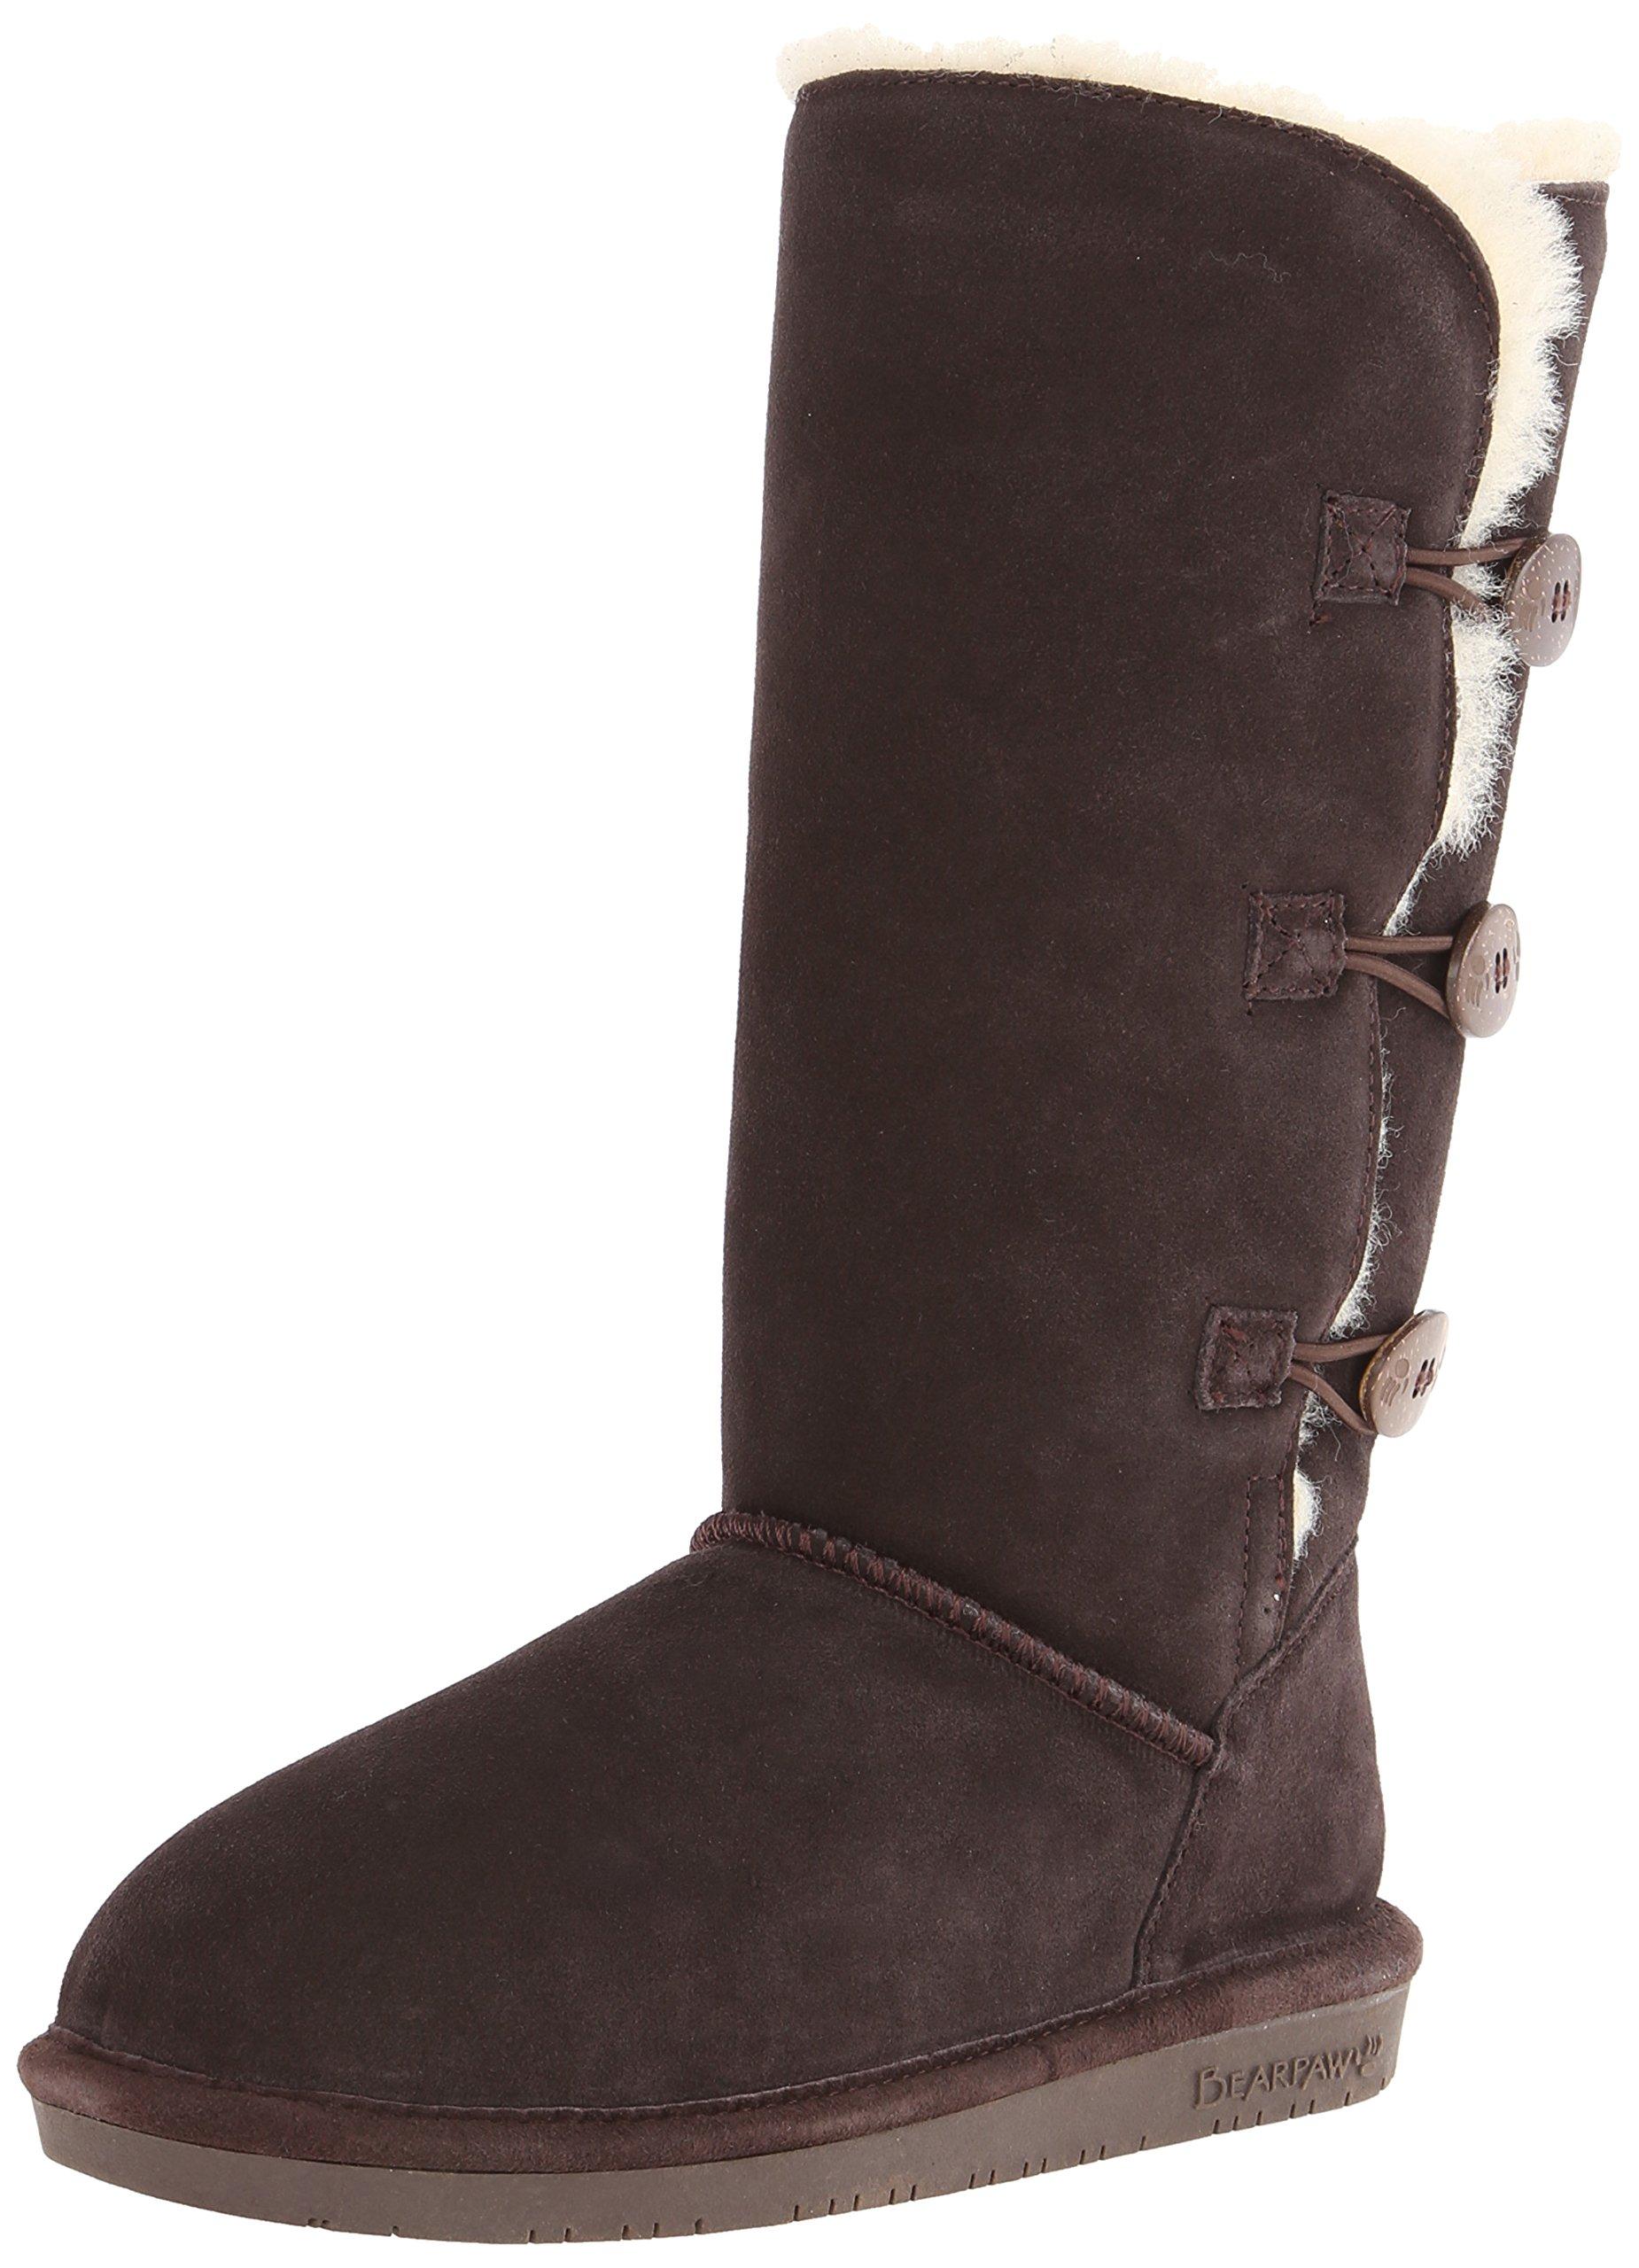 BEARPAW Women's Lauren Tall Winter Boot, Chocolate, 7 M US